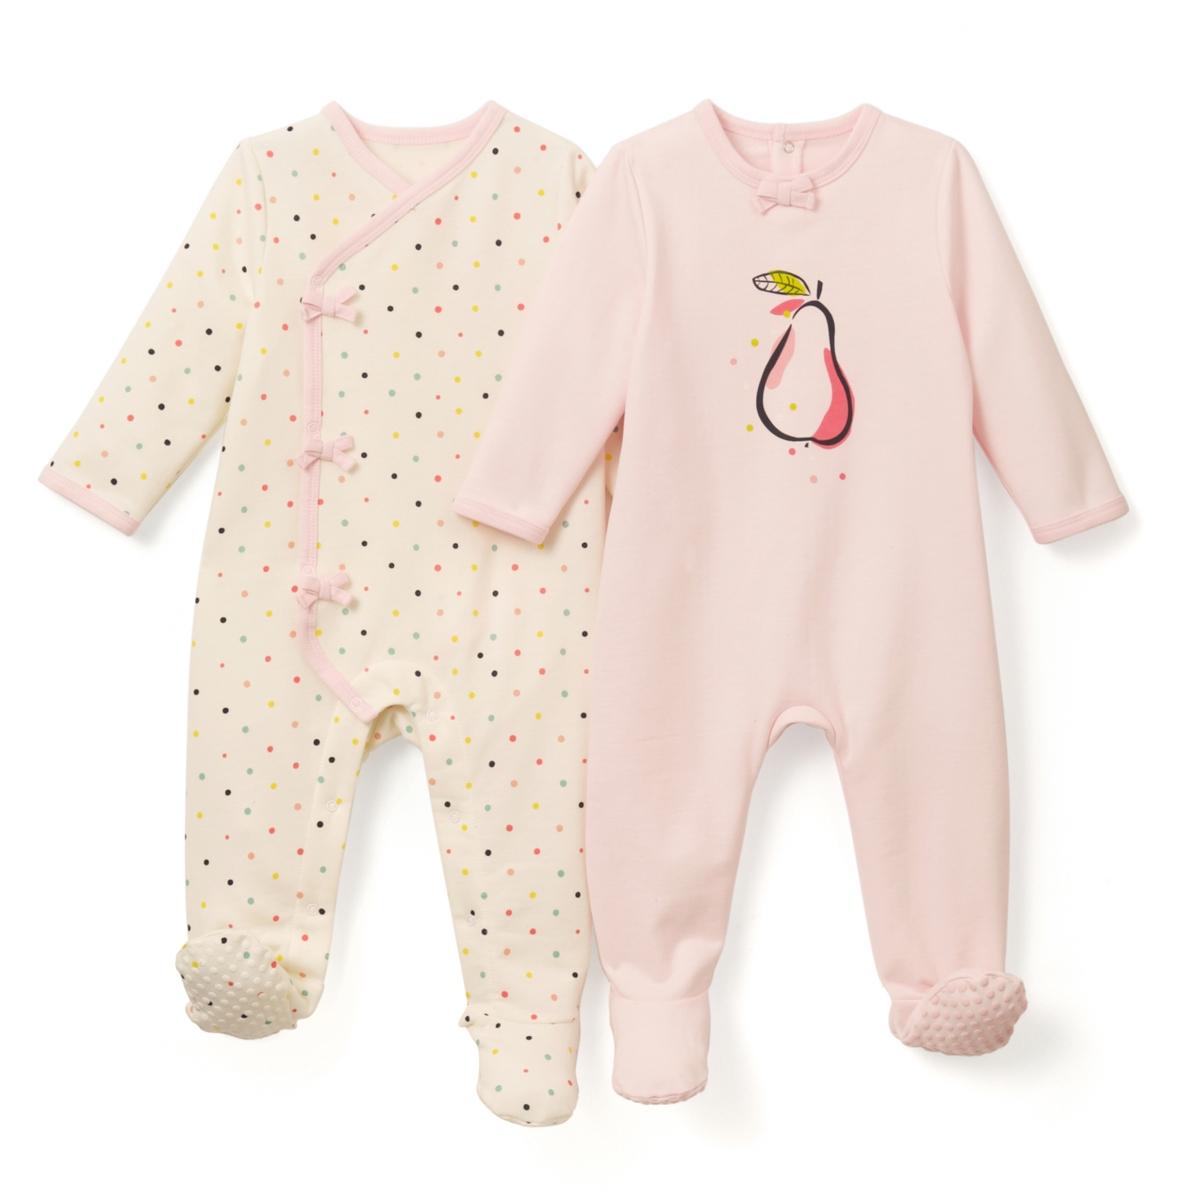 2 пижамы из мольтона 0 мес-3 лет